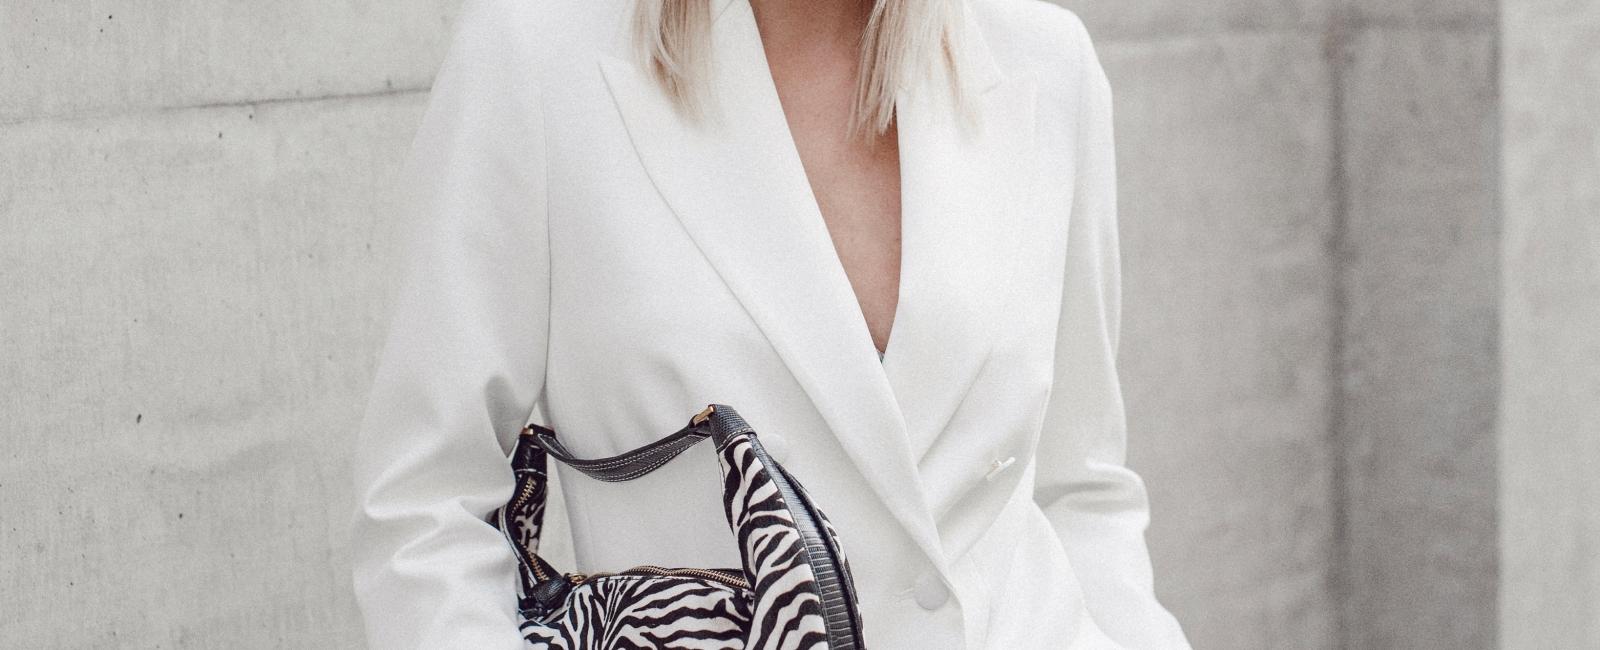 MOD-by-Monique-Fashion-Looks-SS2020-Zebra-Staud-2